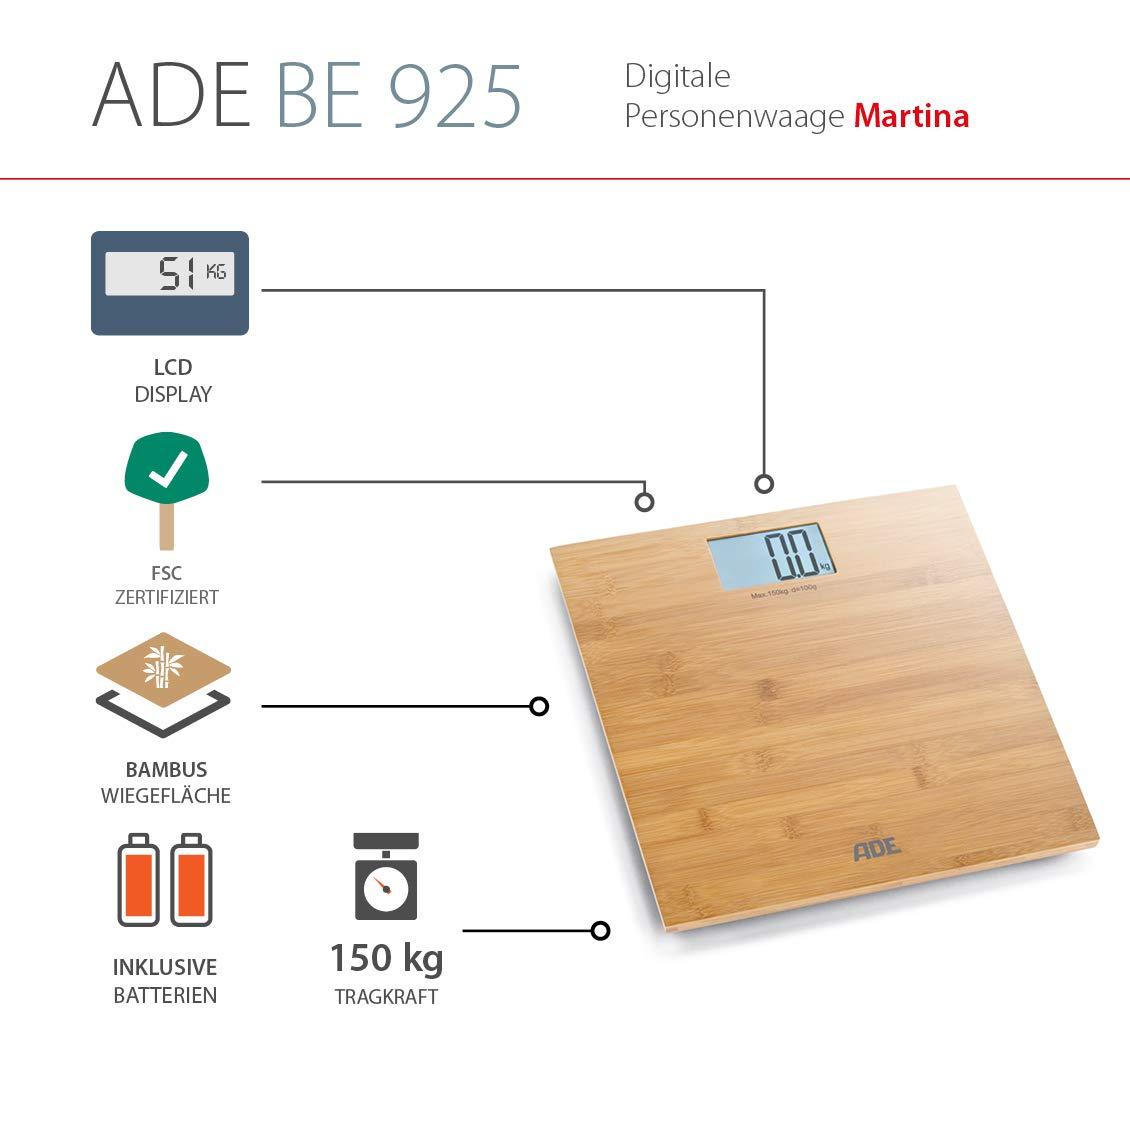 ADE Báscula de baño digital Martina BE925. Balanza personal electrónica hecha en 100% Bambu. Capacidad hasta 150kg. Pantalla LCD. Incluye baterías.